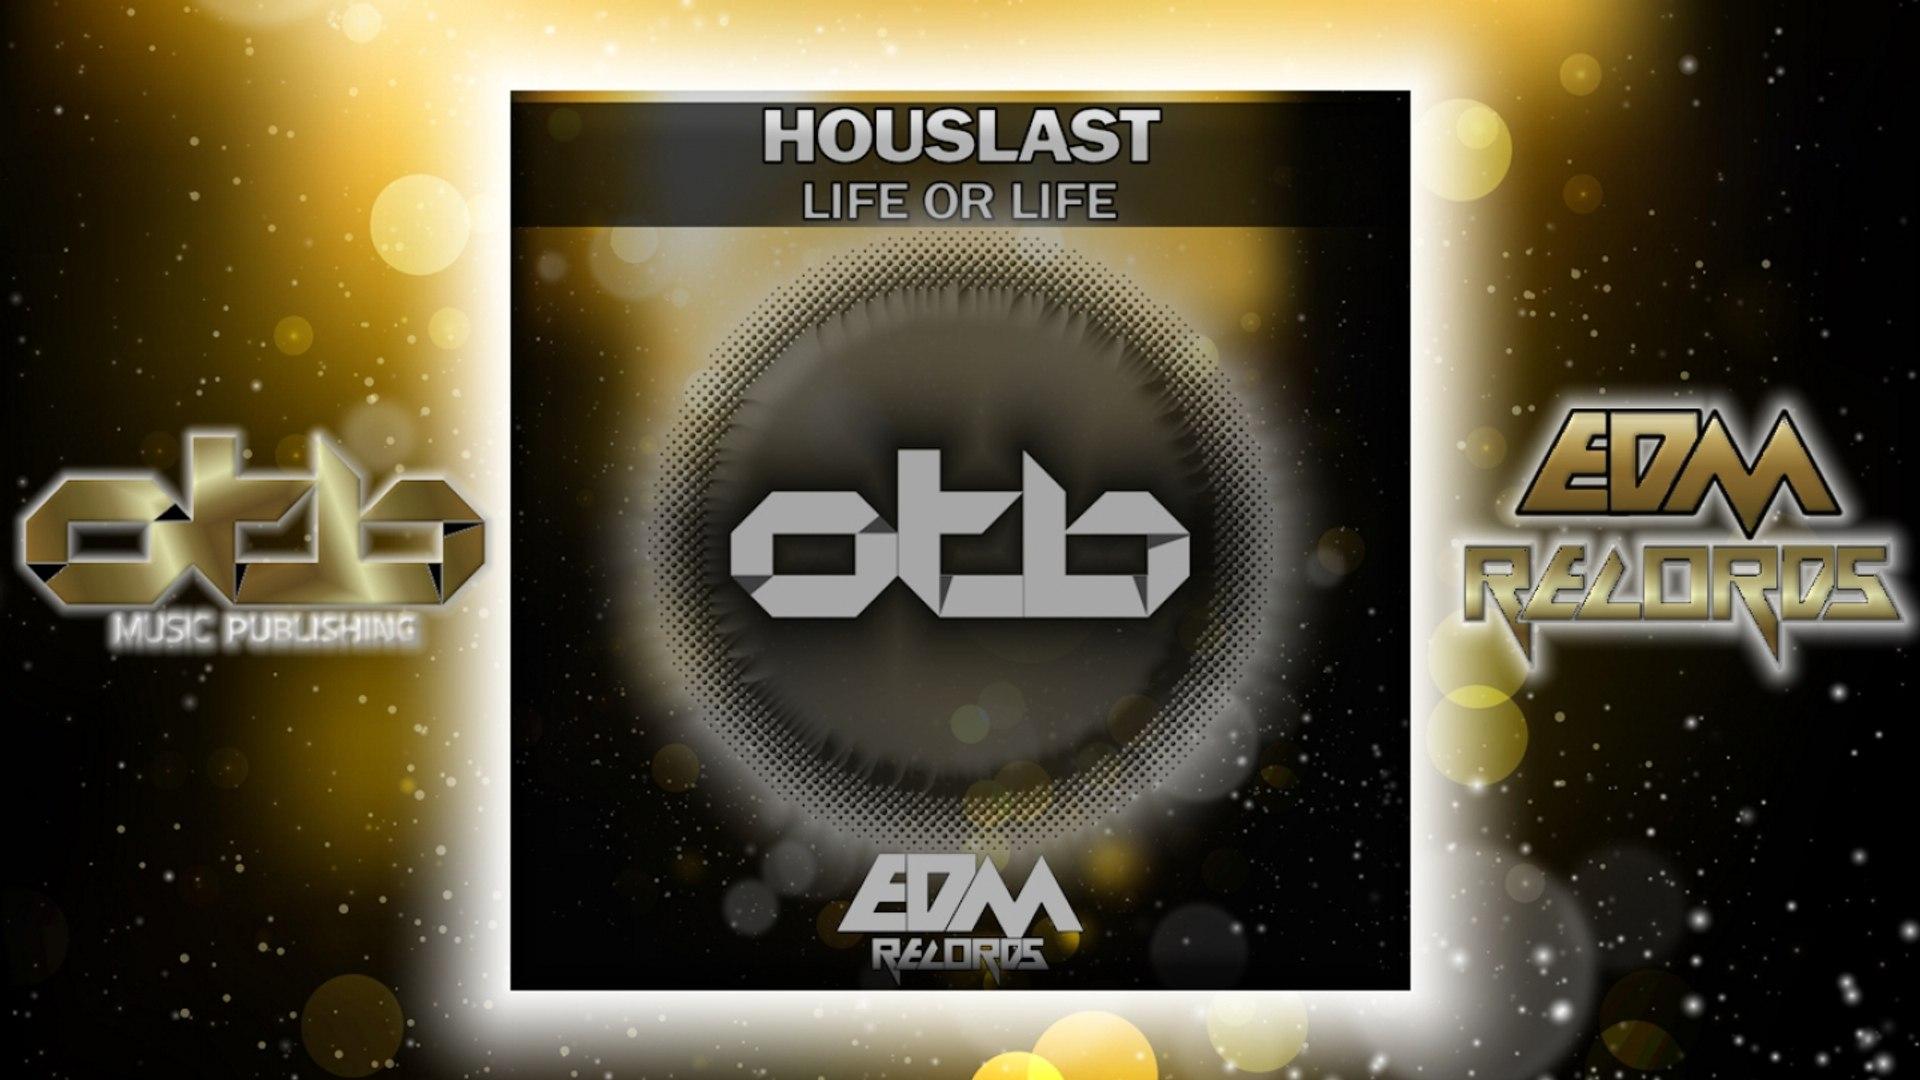 Houslast - Life or Life [EP] - [EDM 2018]